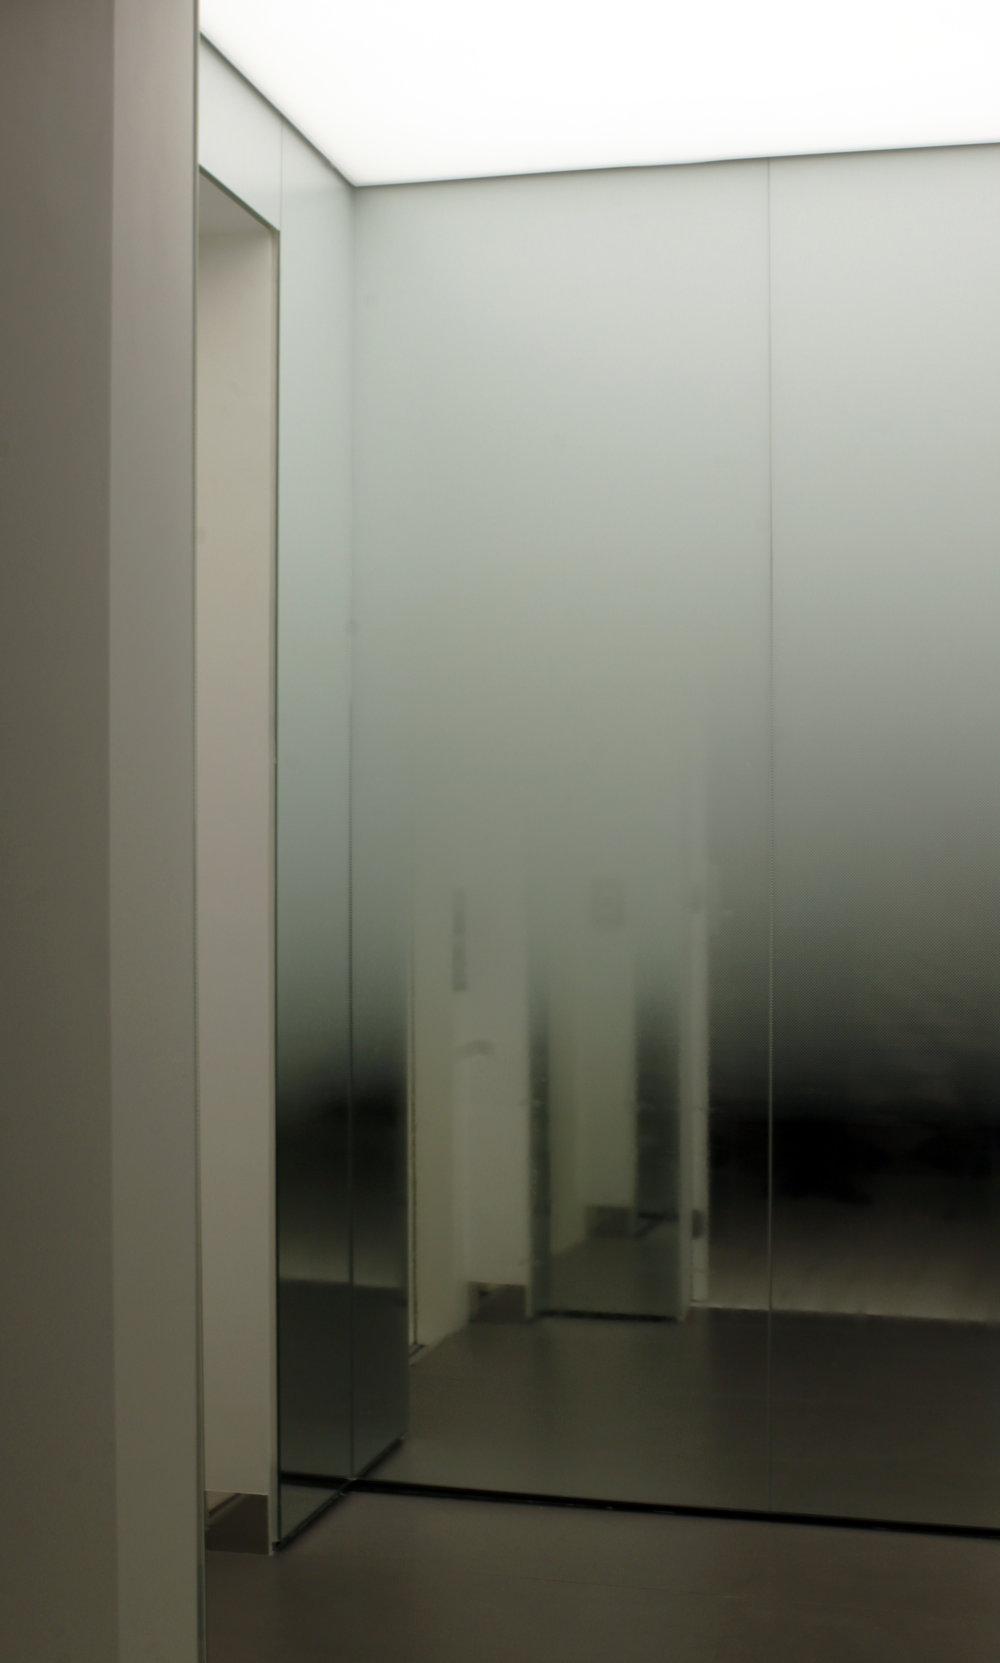 apartamento_moire_pistache_ganache_05.jpg